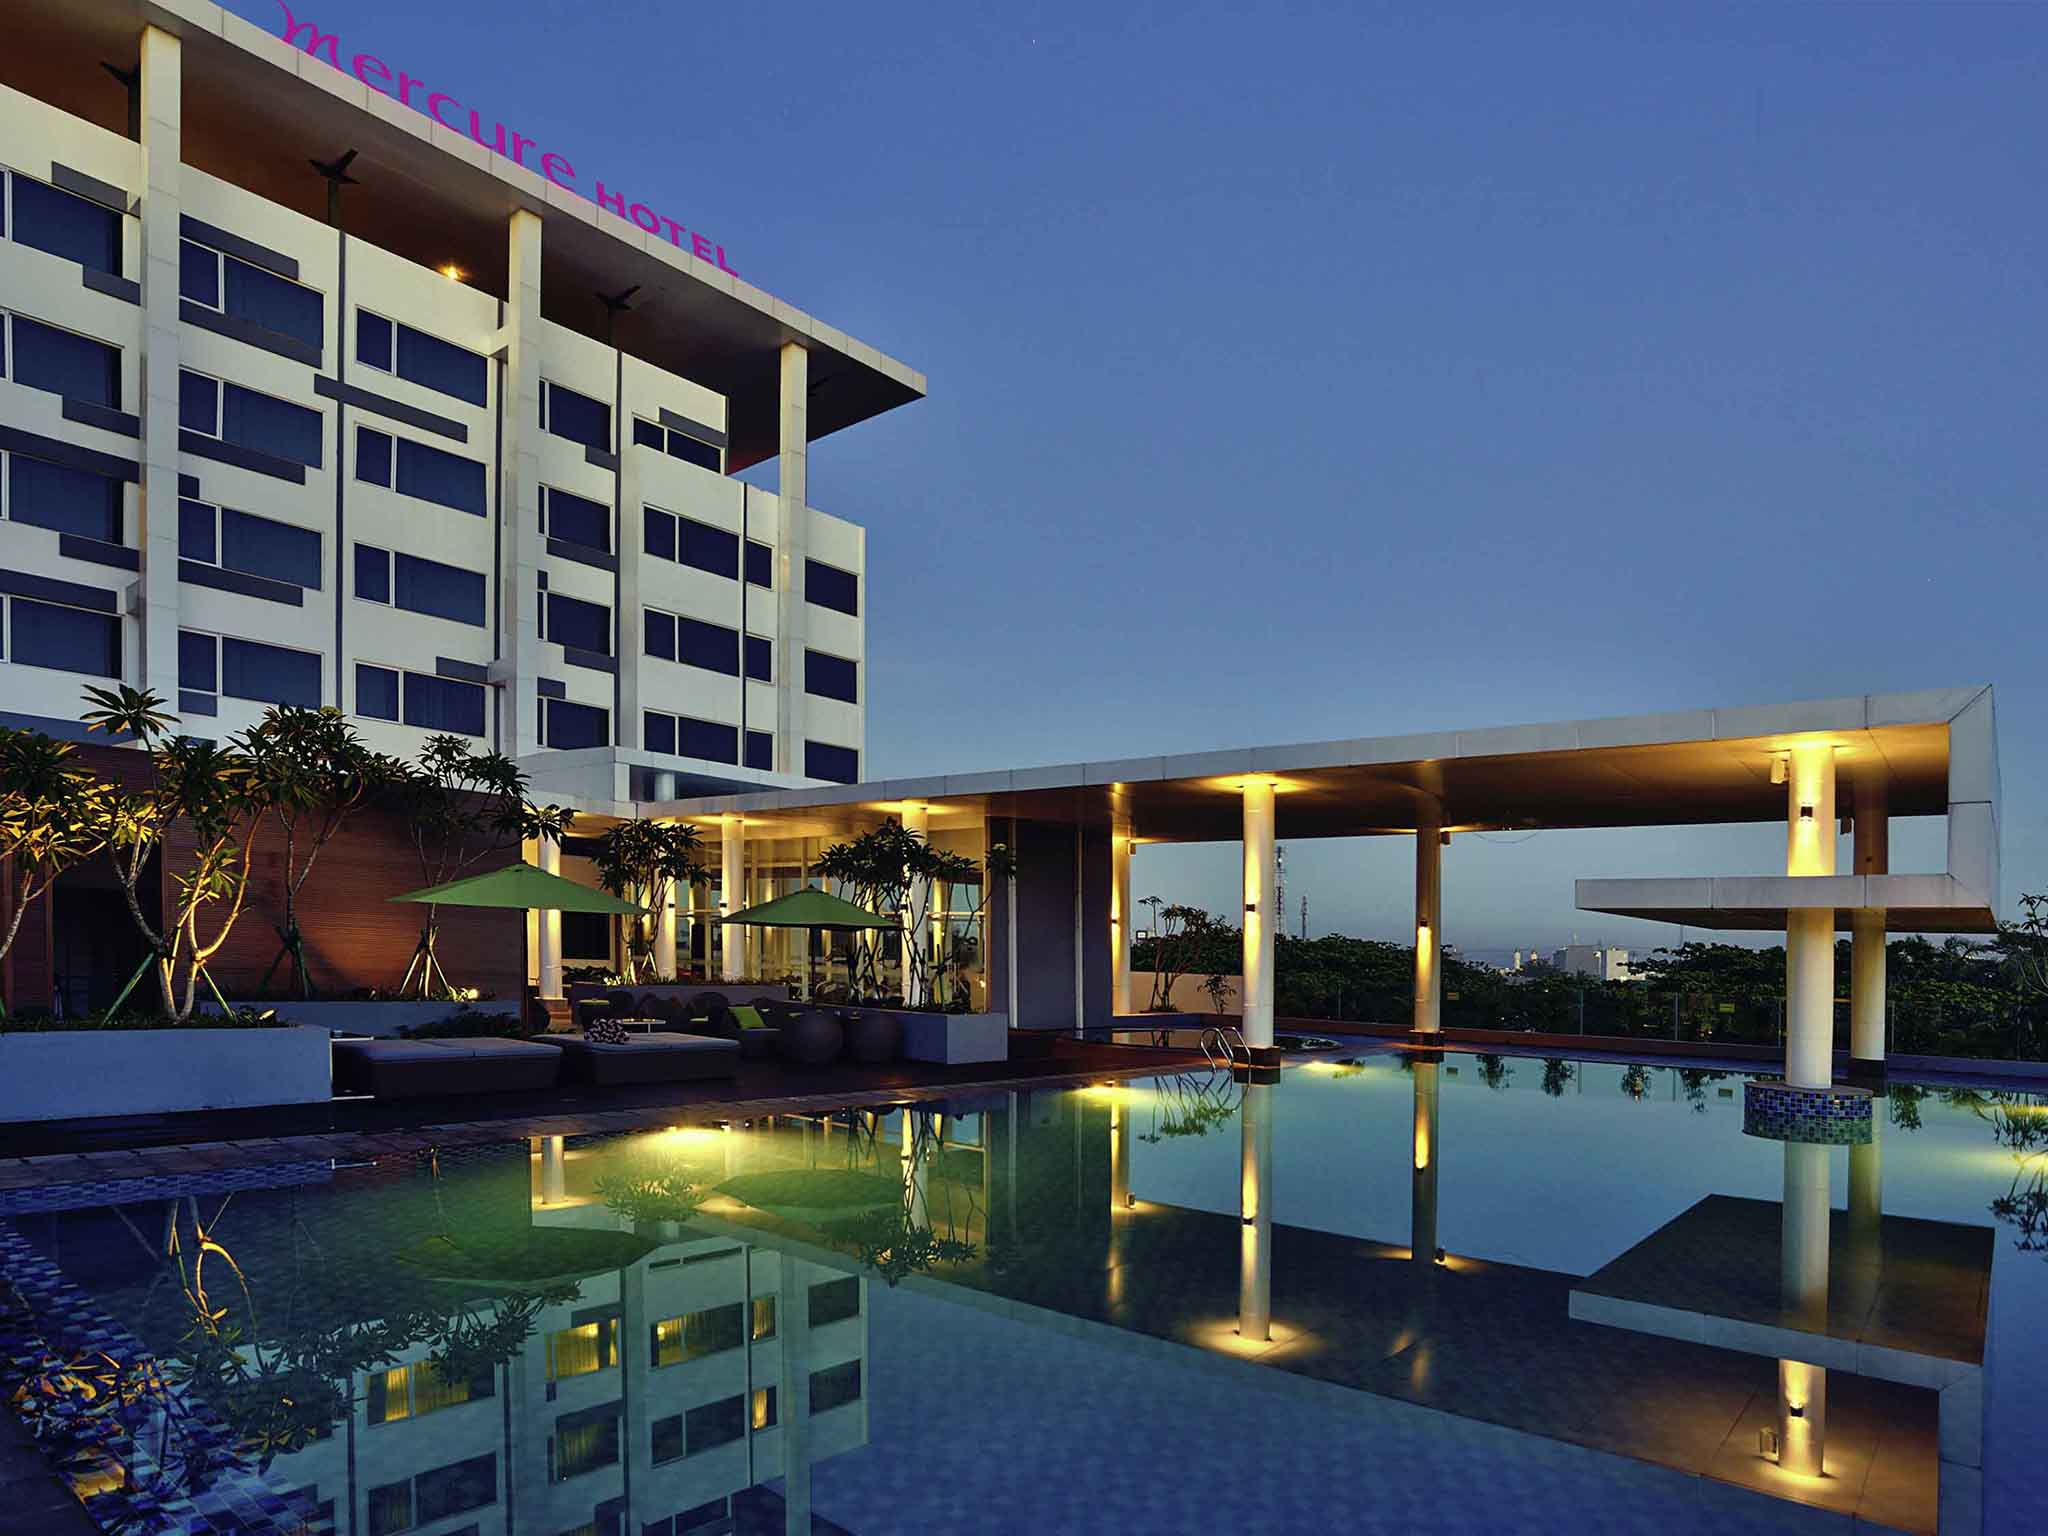 Hotel emily hotel r -  Hotel Mercure Serpong Alam Sutera